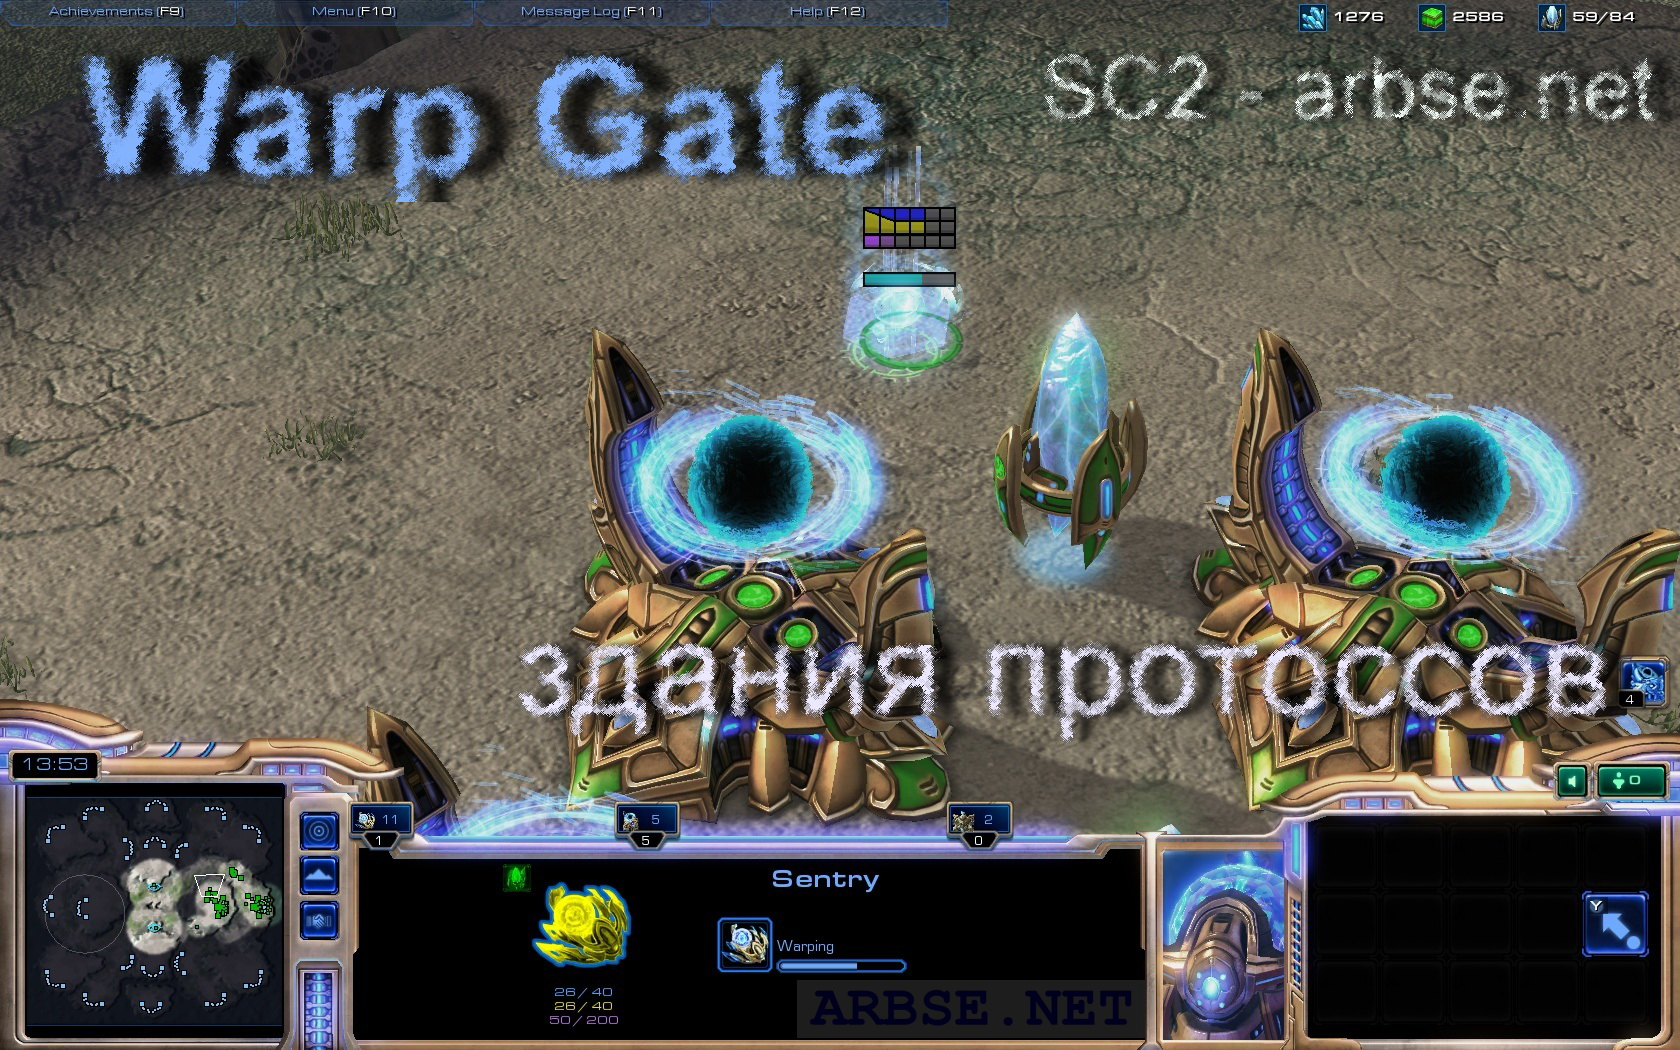 Скачать файл gate reg для диабло 2